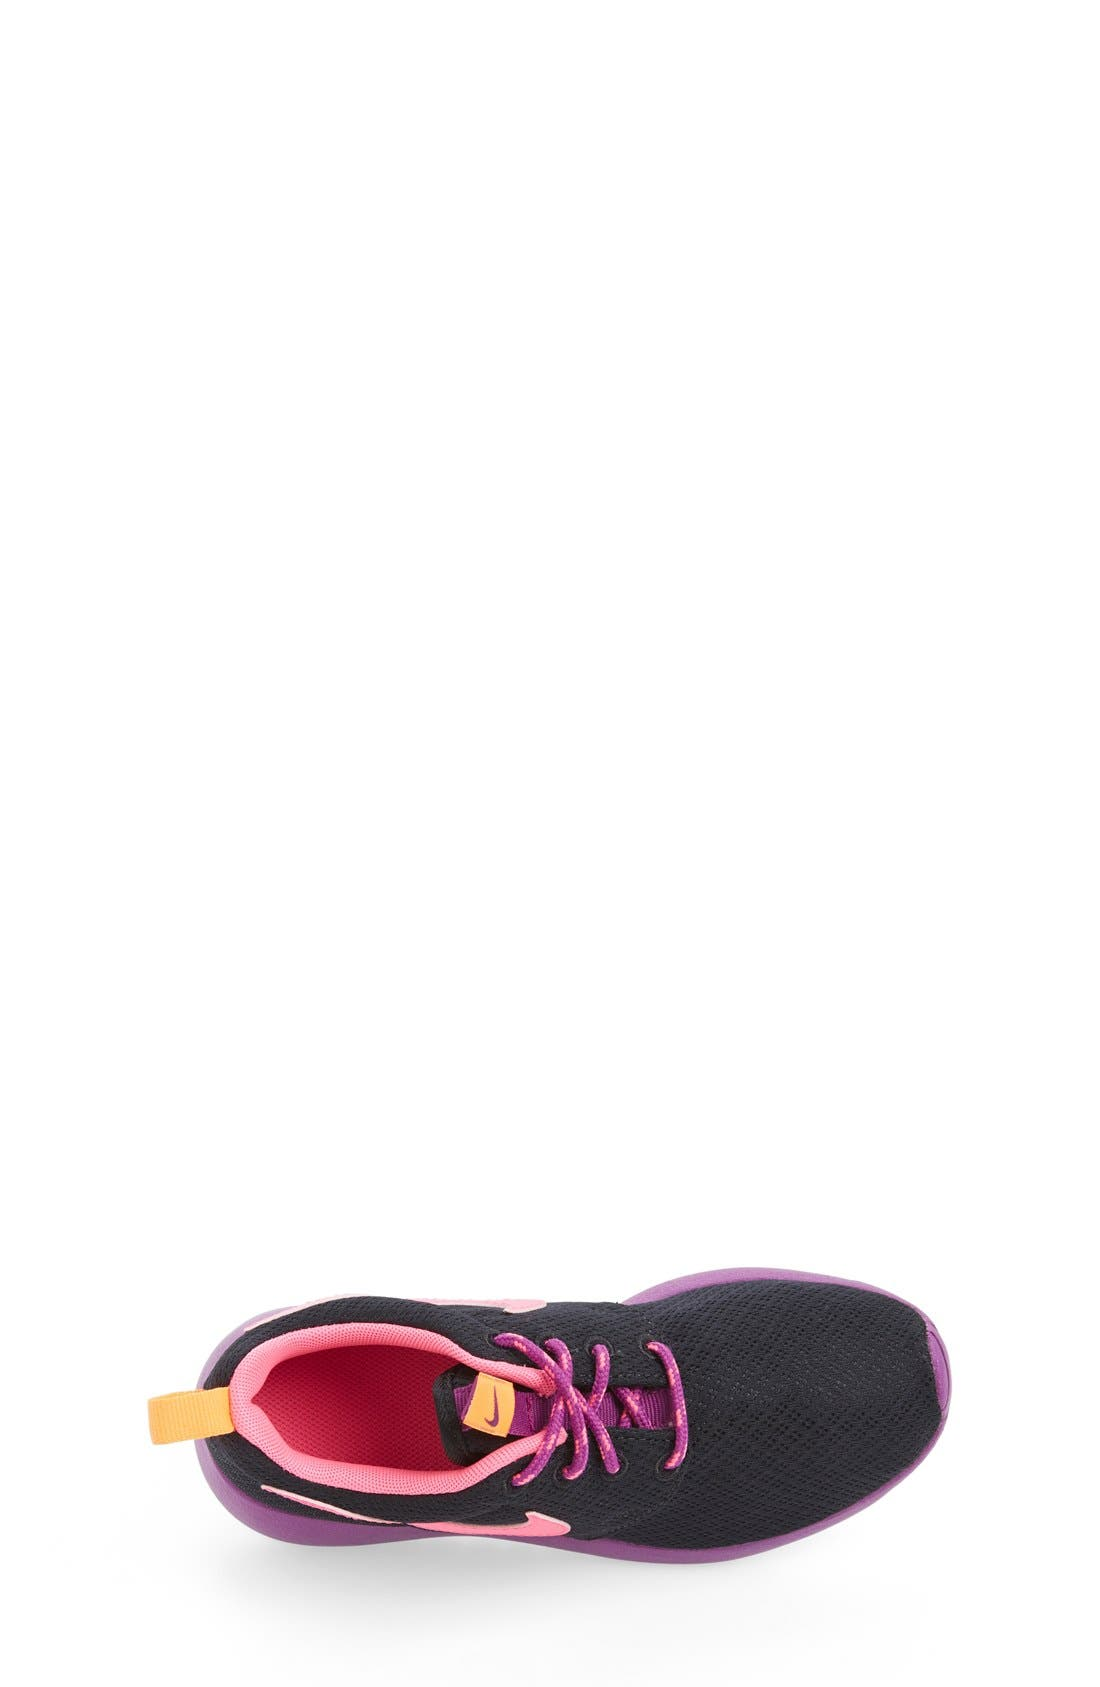 'Roshe Run' Athletic Shoe,                             Alternate thumbnail 155, color,